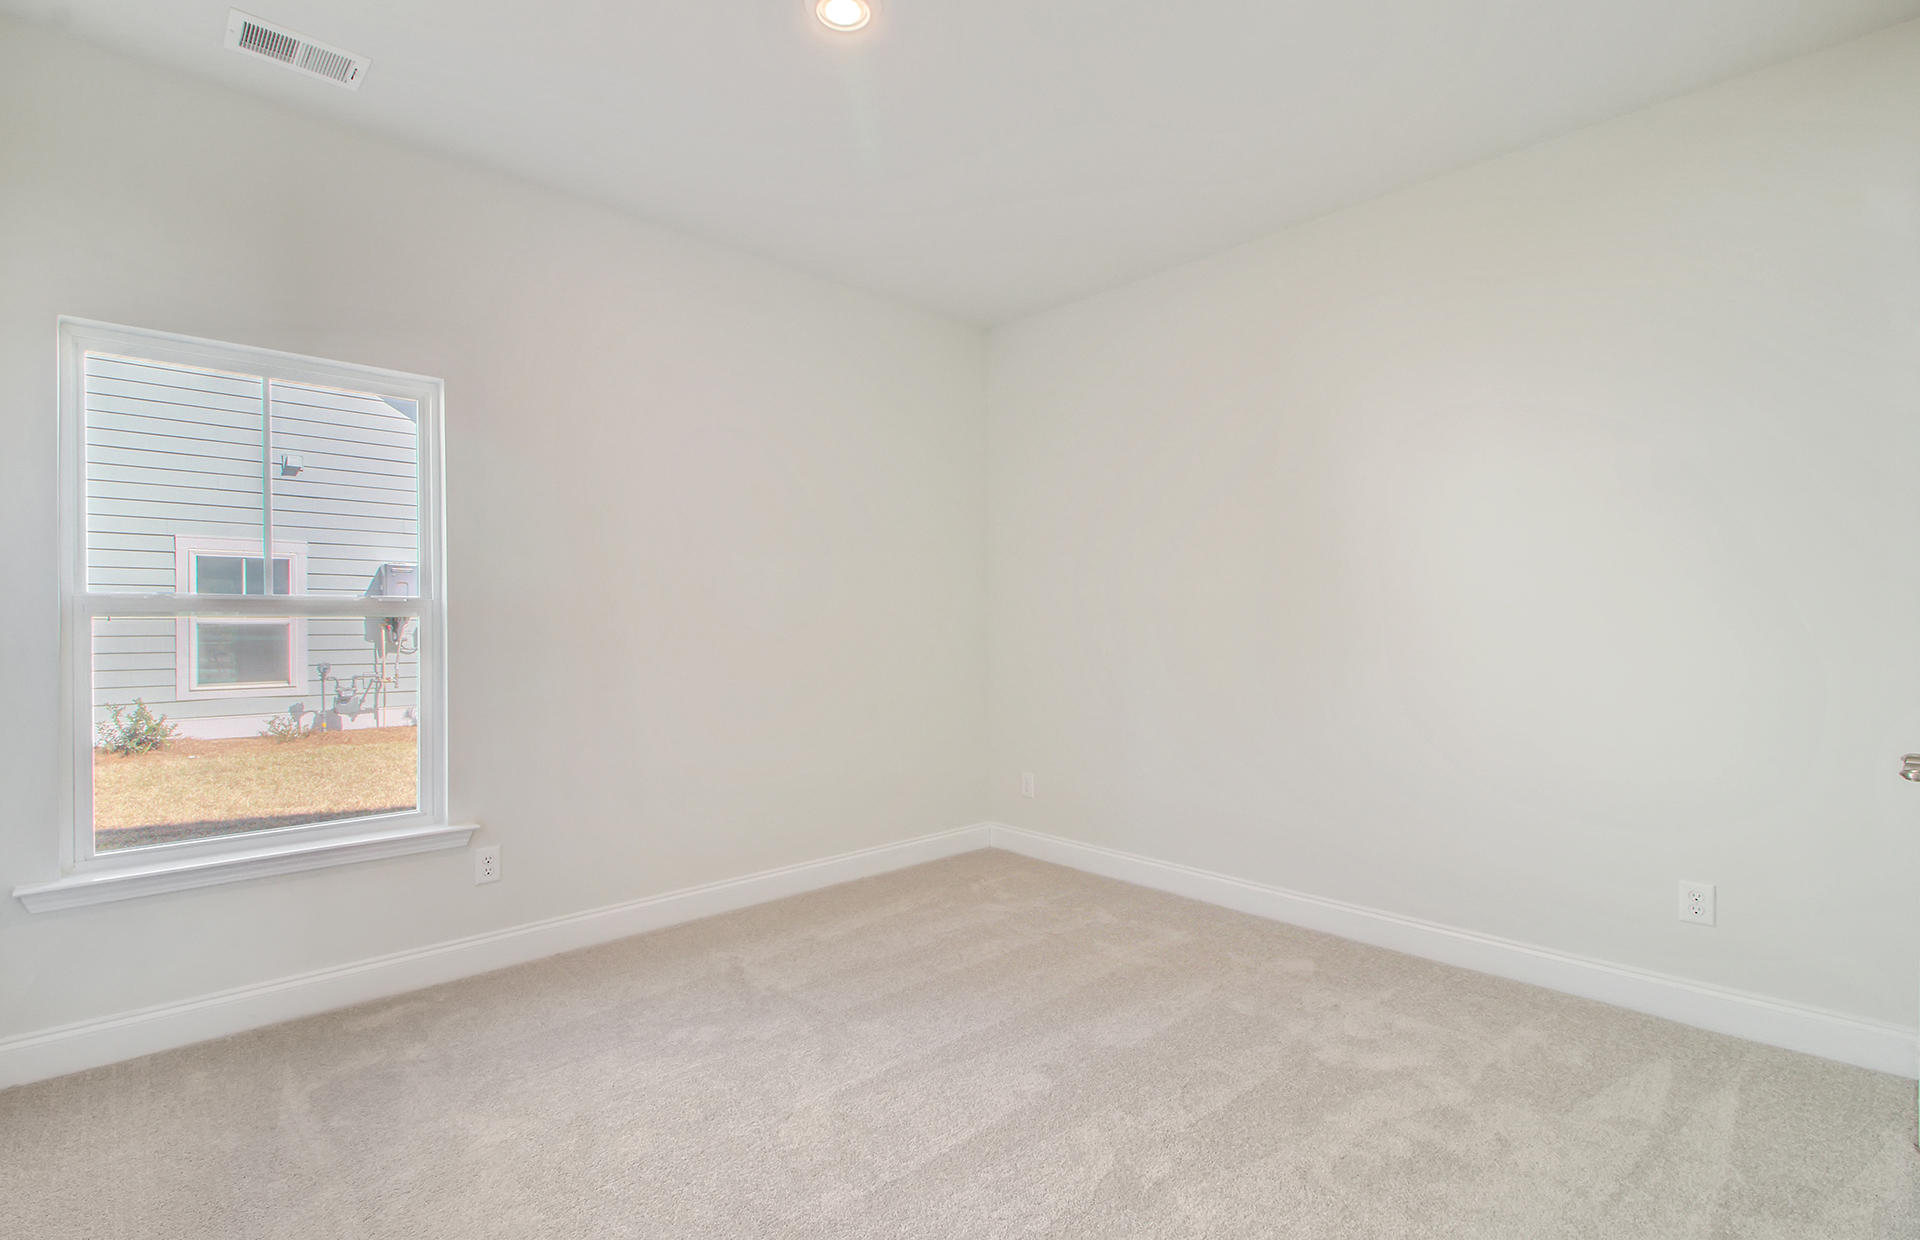 Park West Homes For Sale - 3062 Rice Field, Mount Pleasant, SC - 26